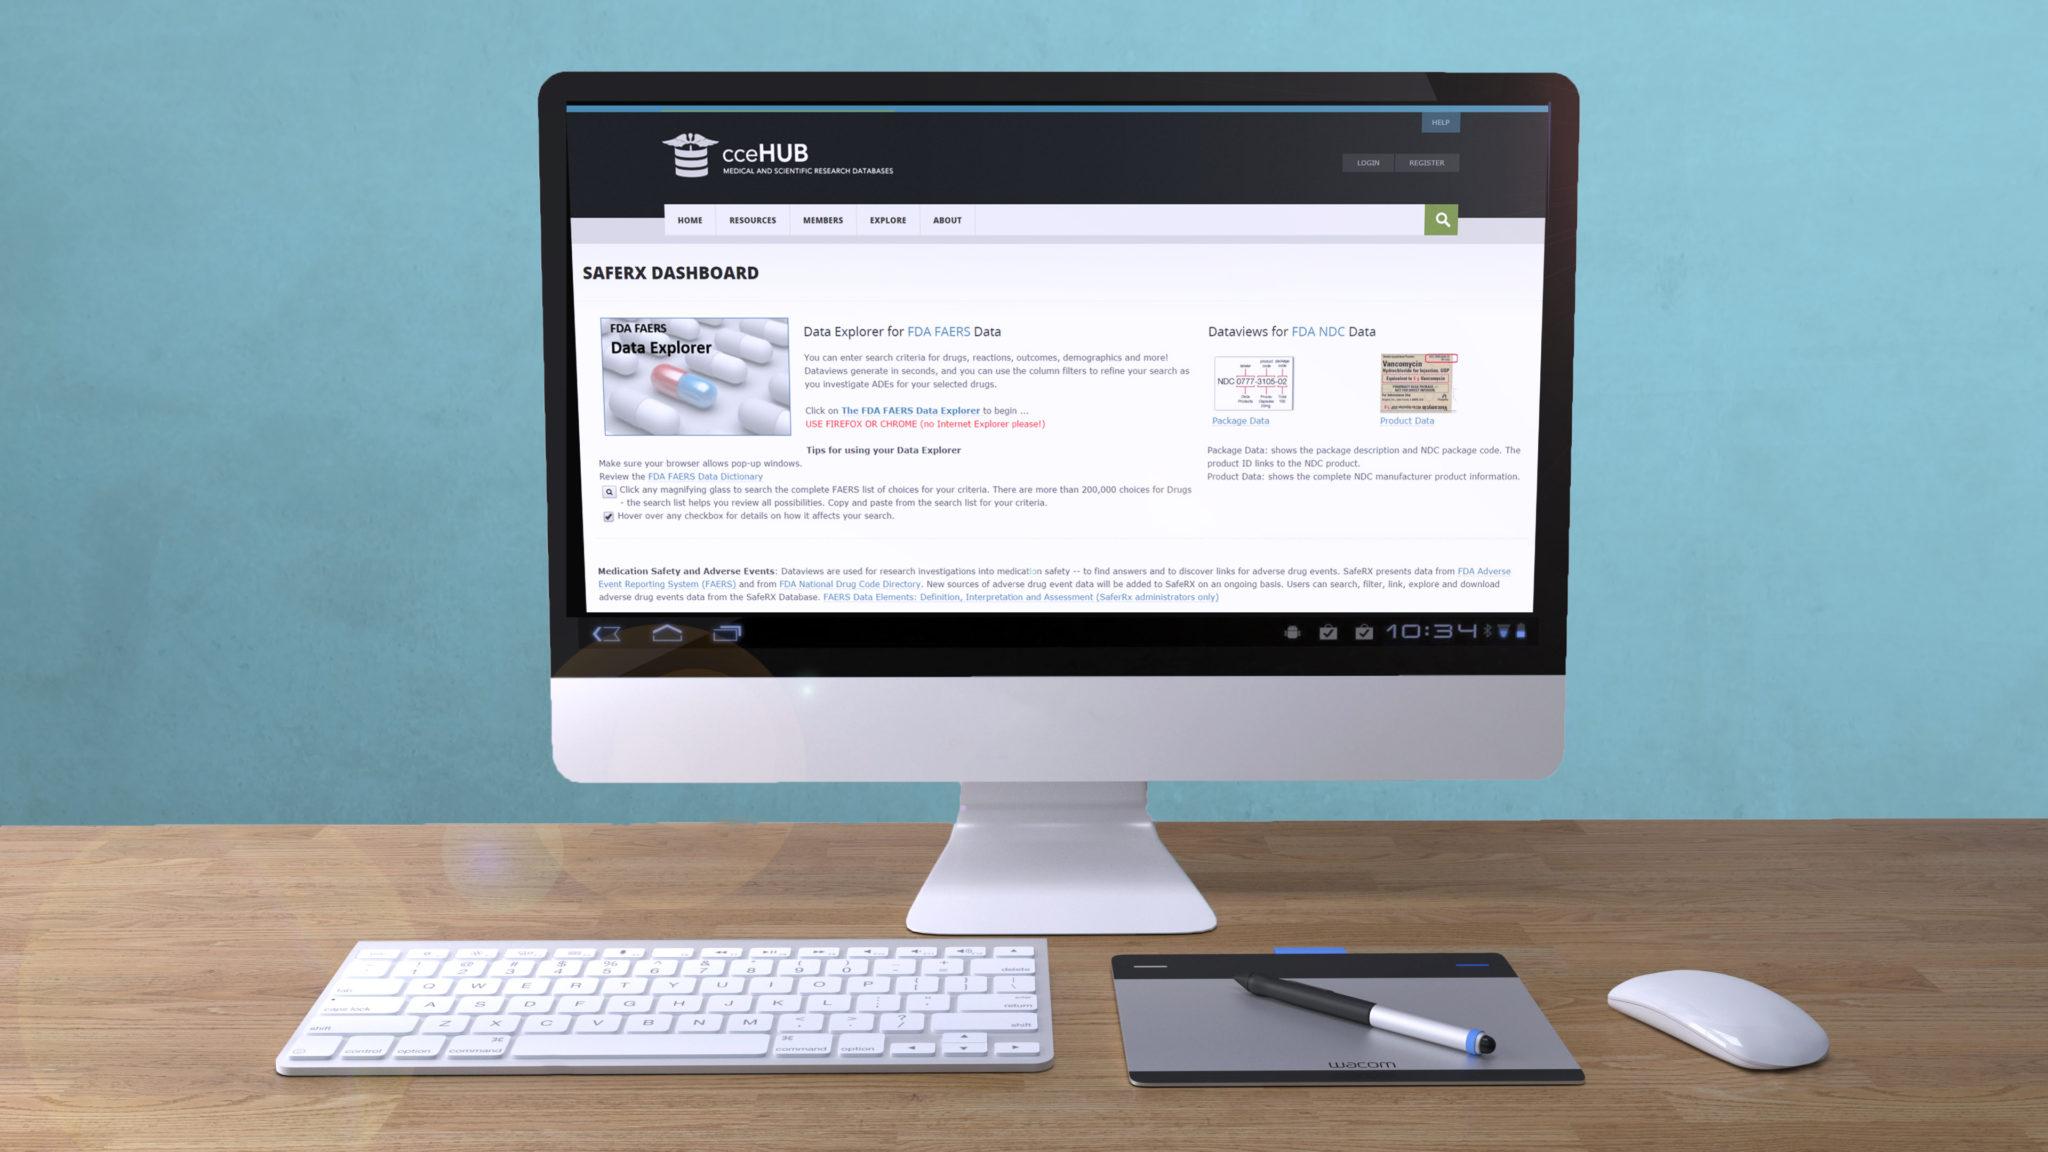 Computer showing SafeRX database